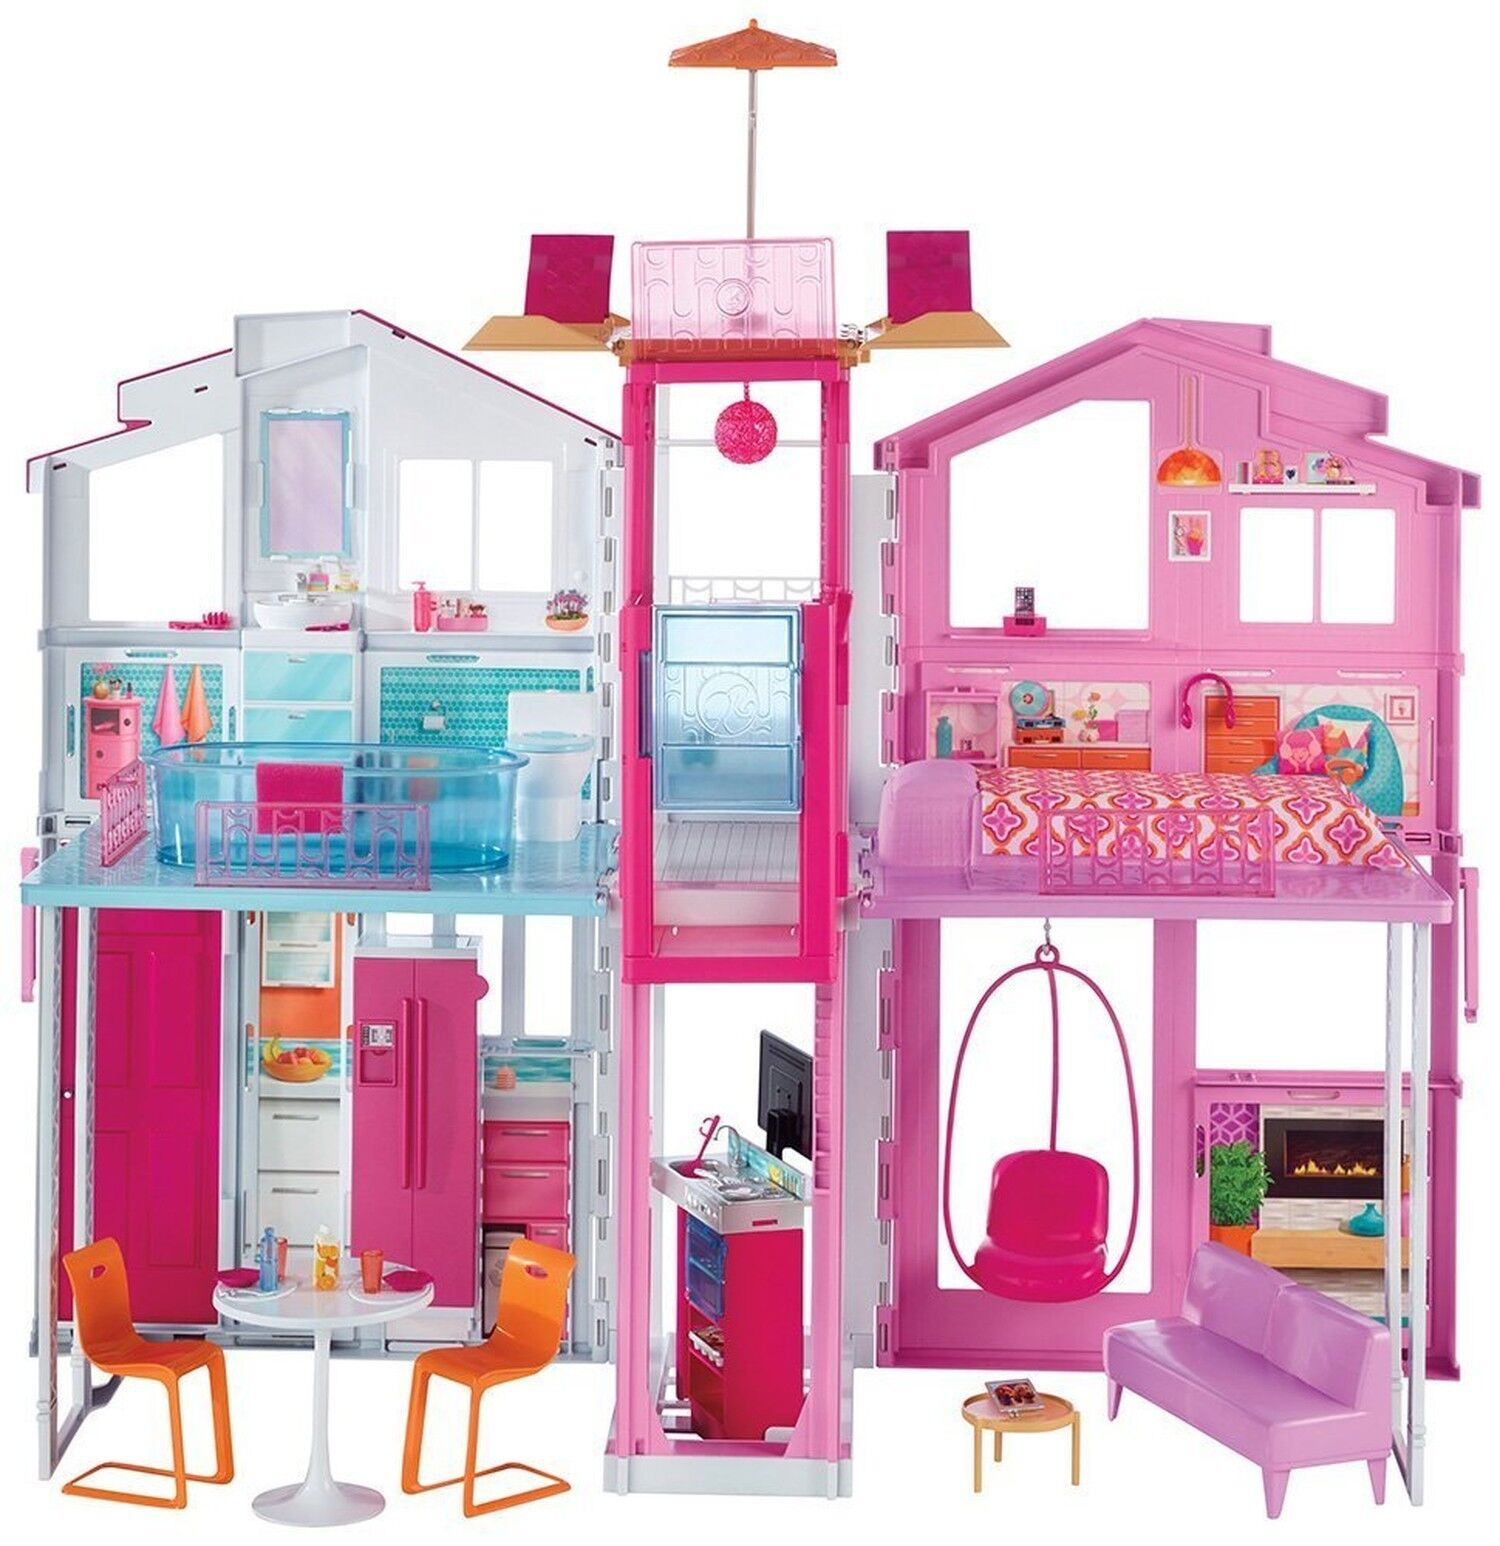 Barbie DLY32 TRE PIANI TOWNHOUSE Playset